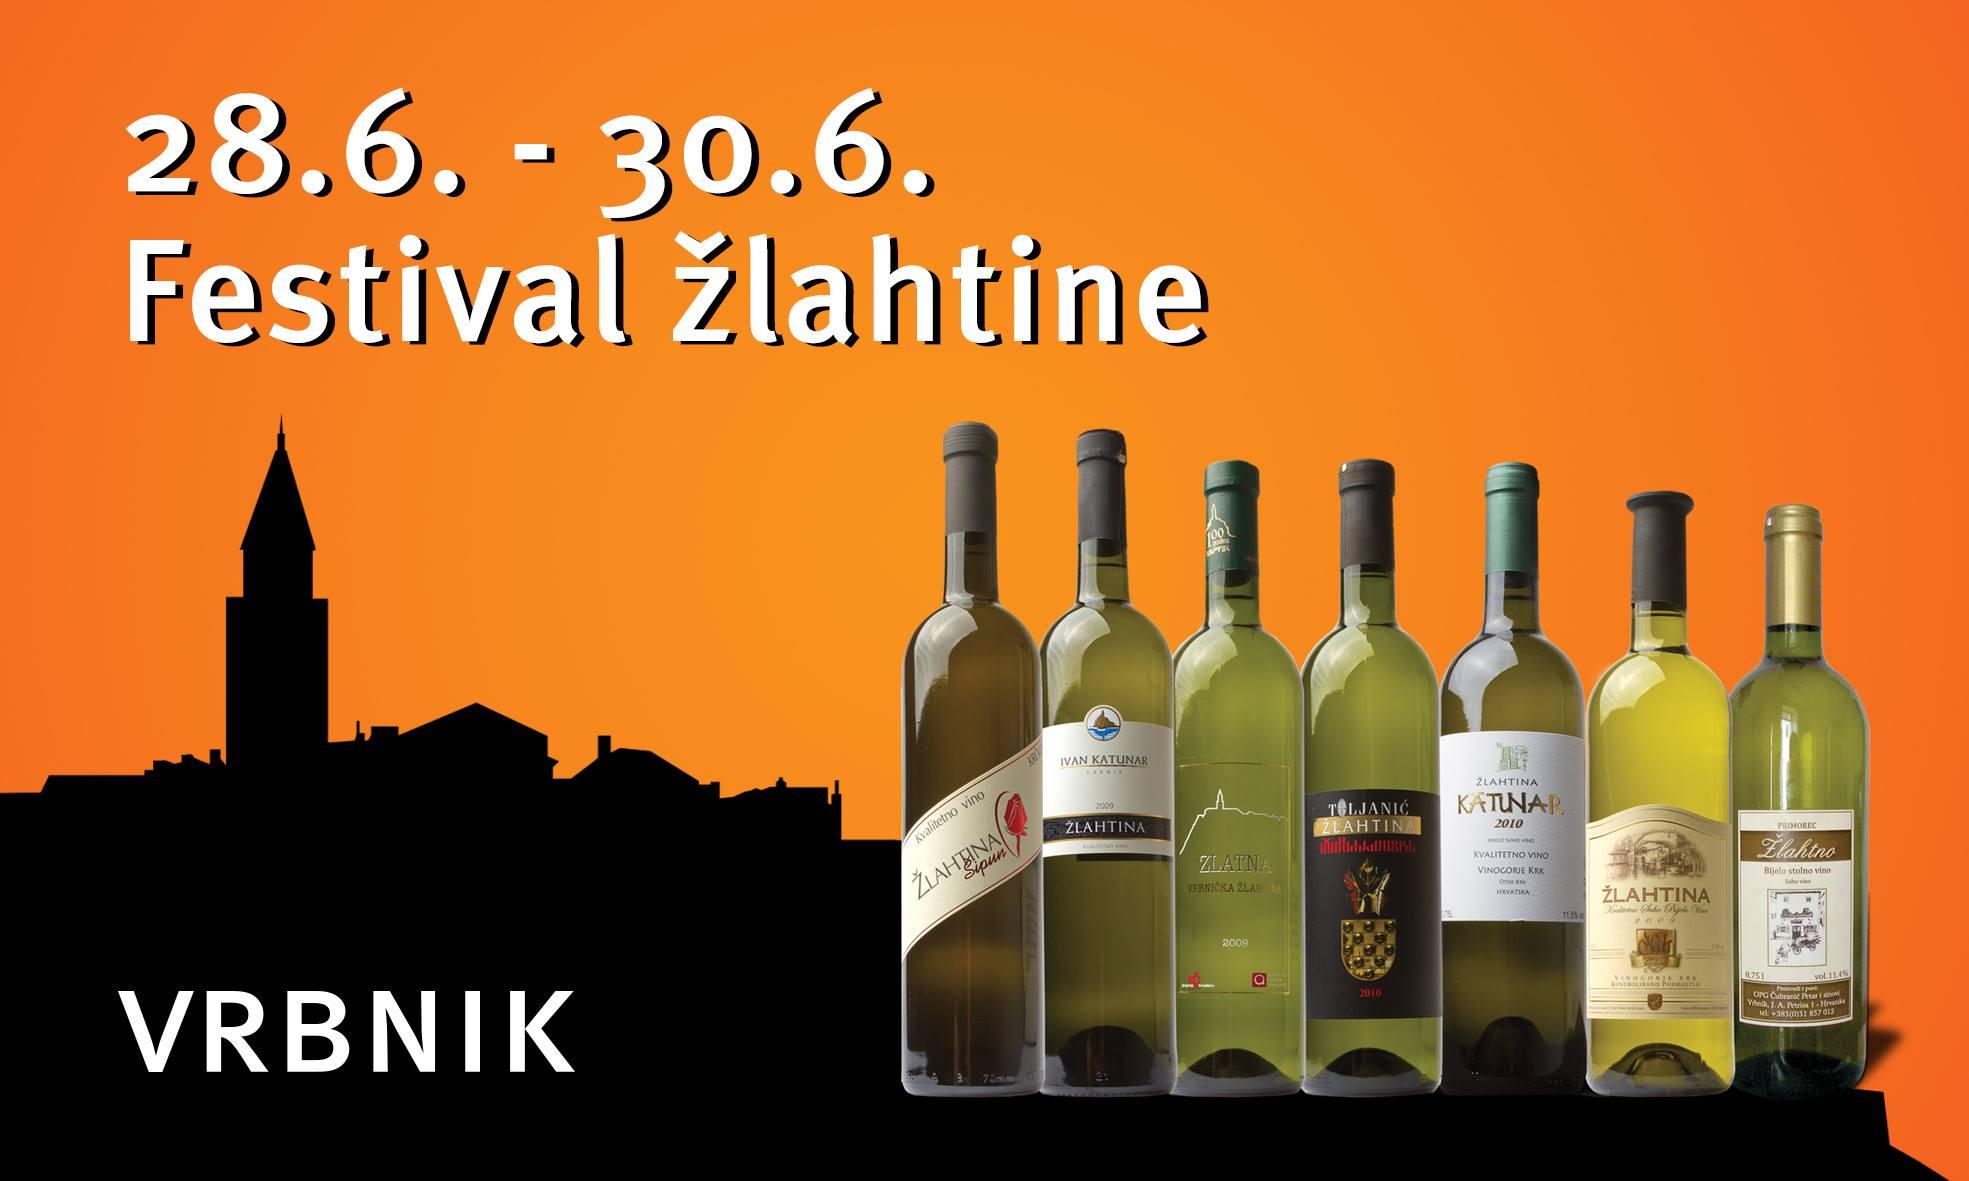 Festival lahtine